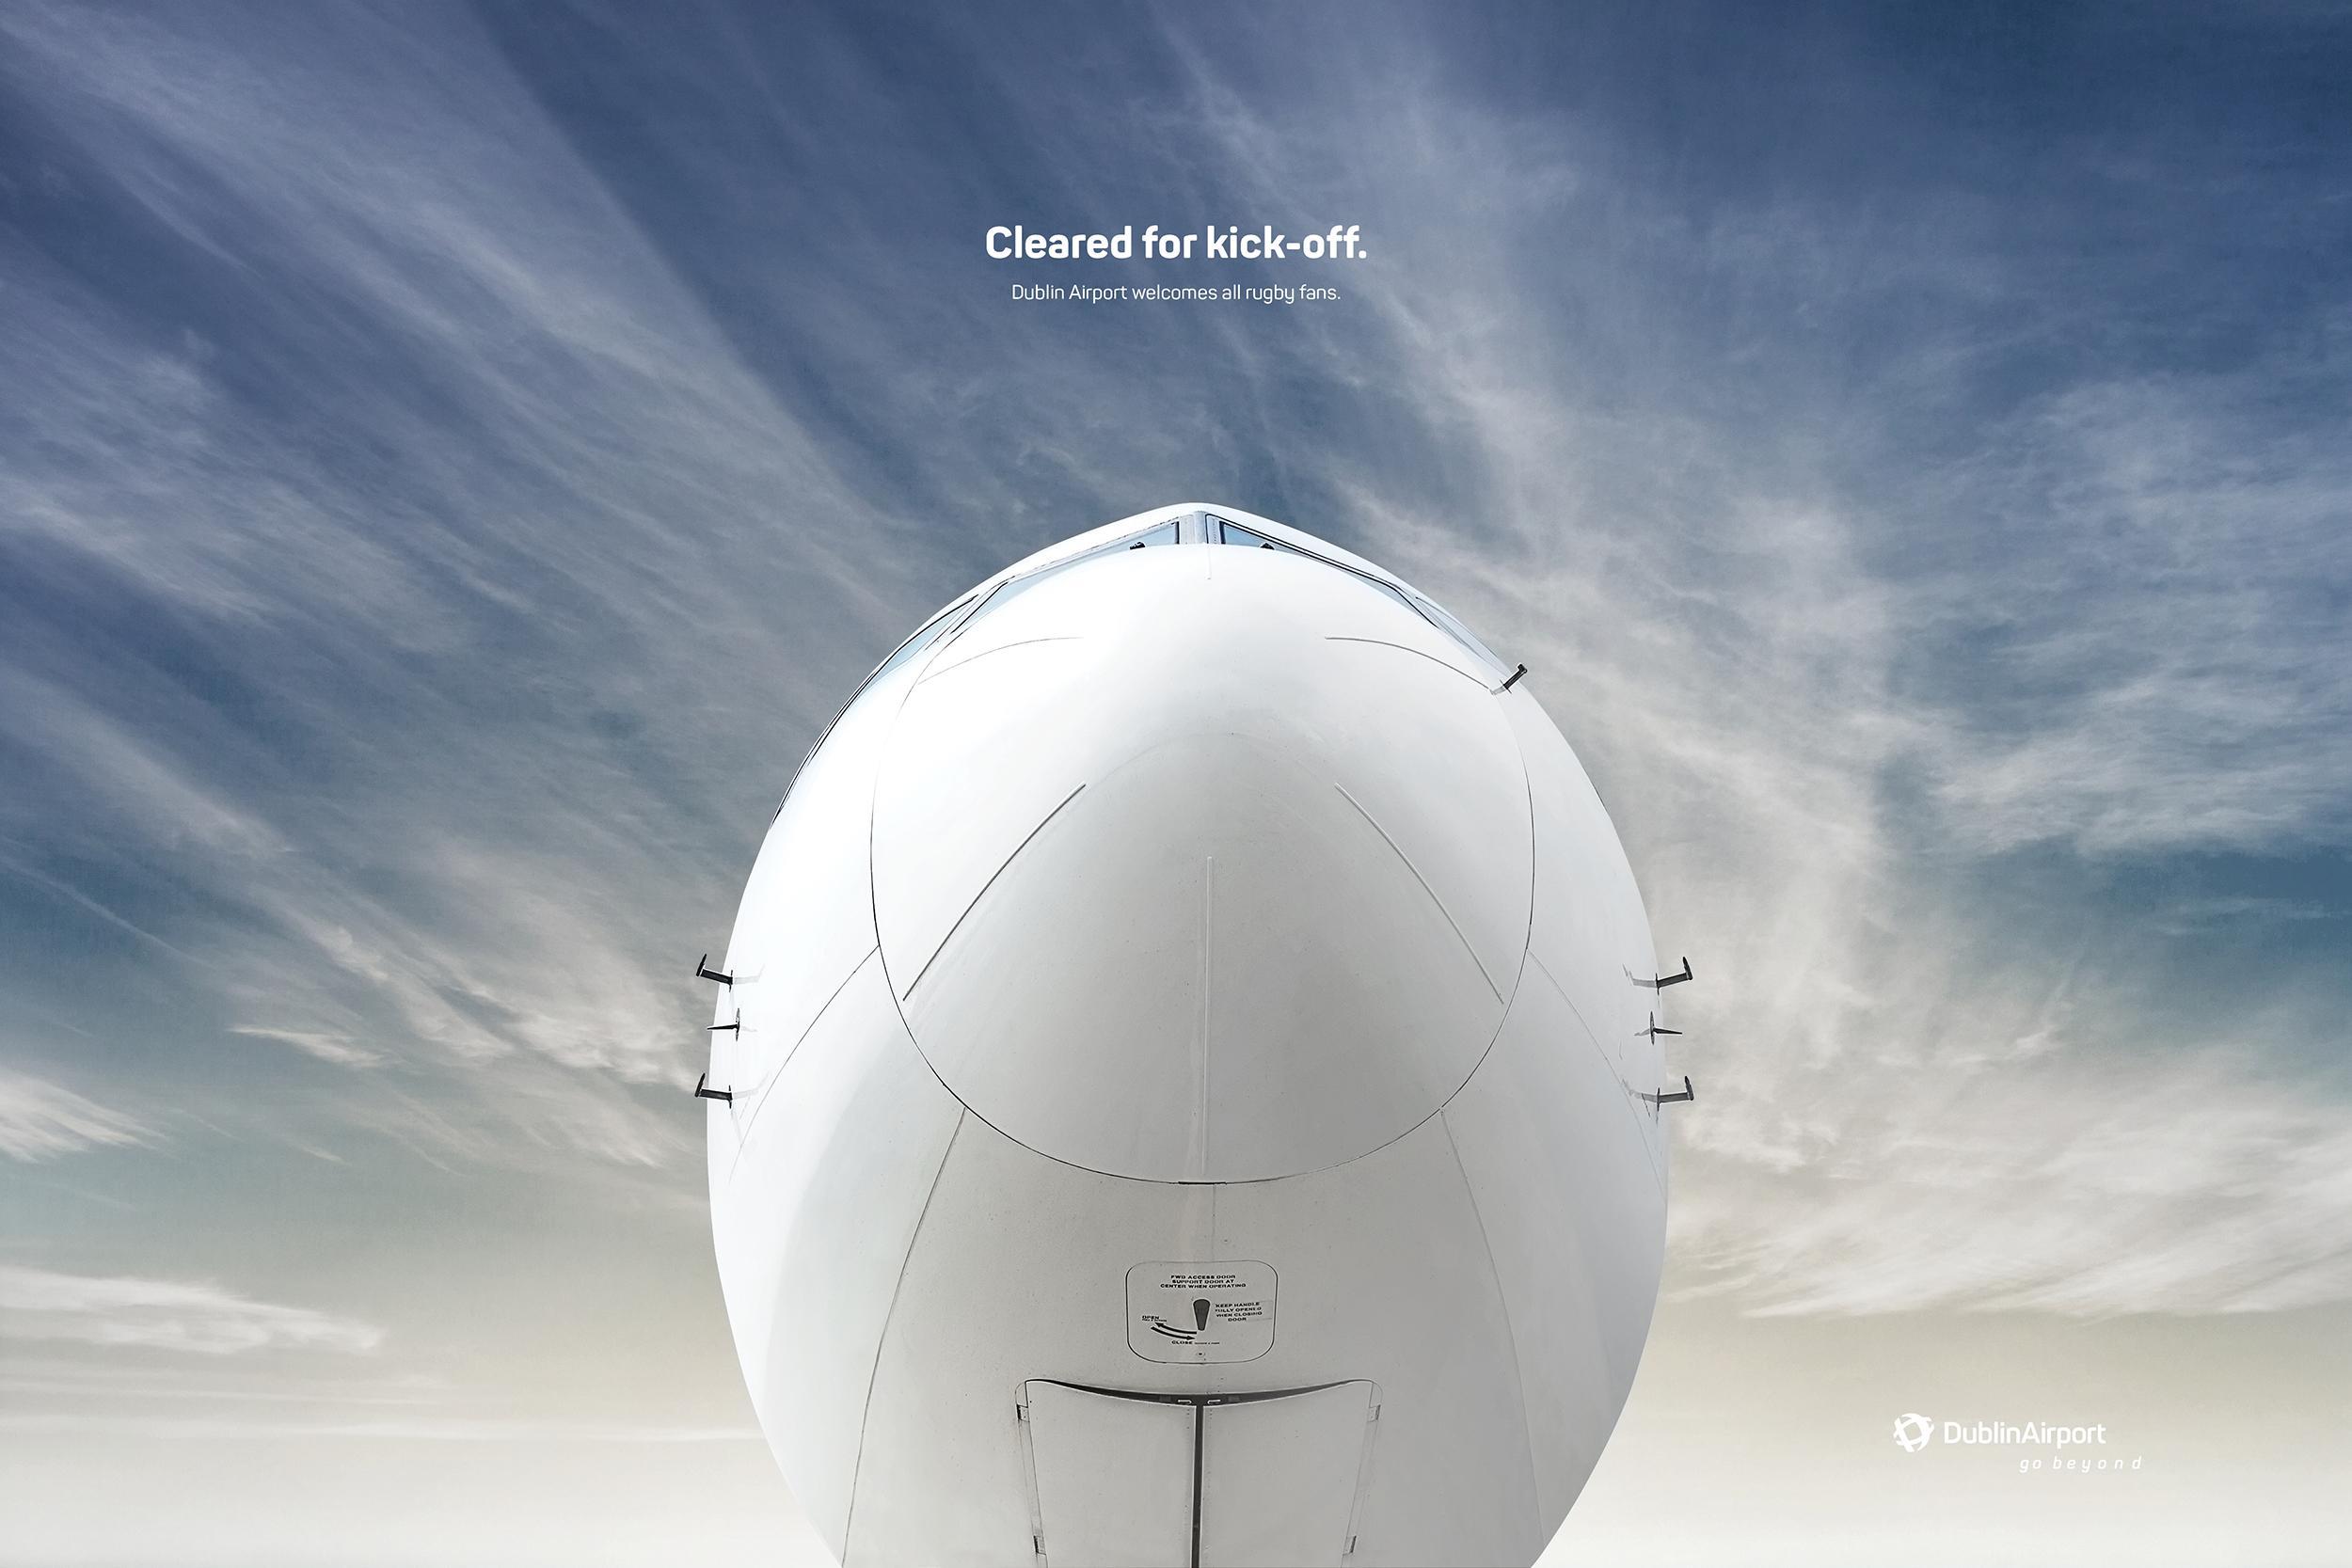 Dublin Airport Print Ad - Kick-off